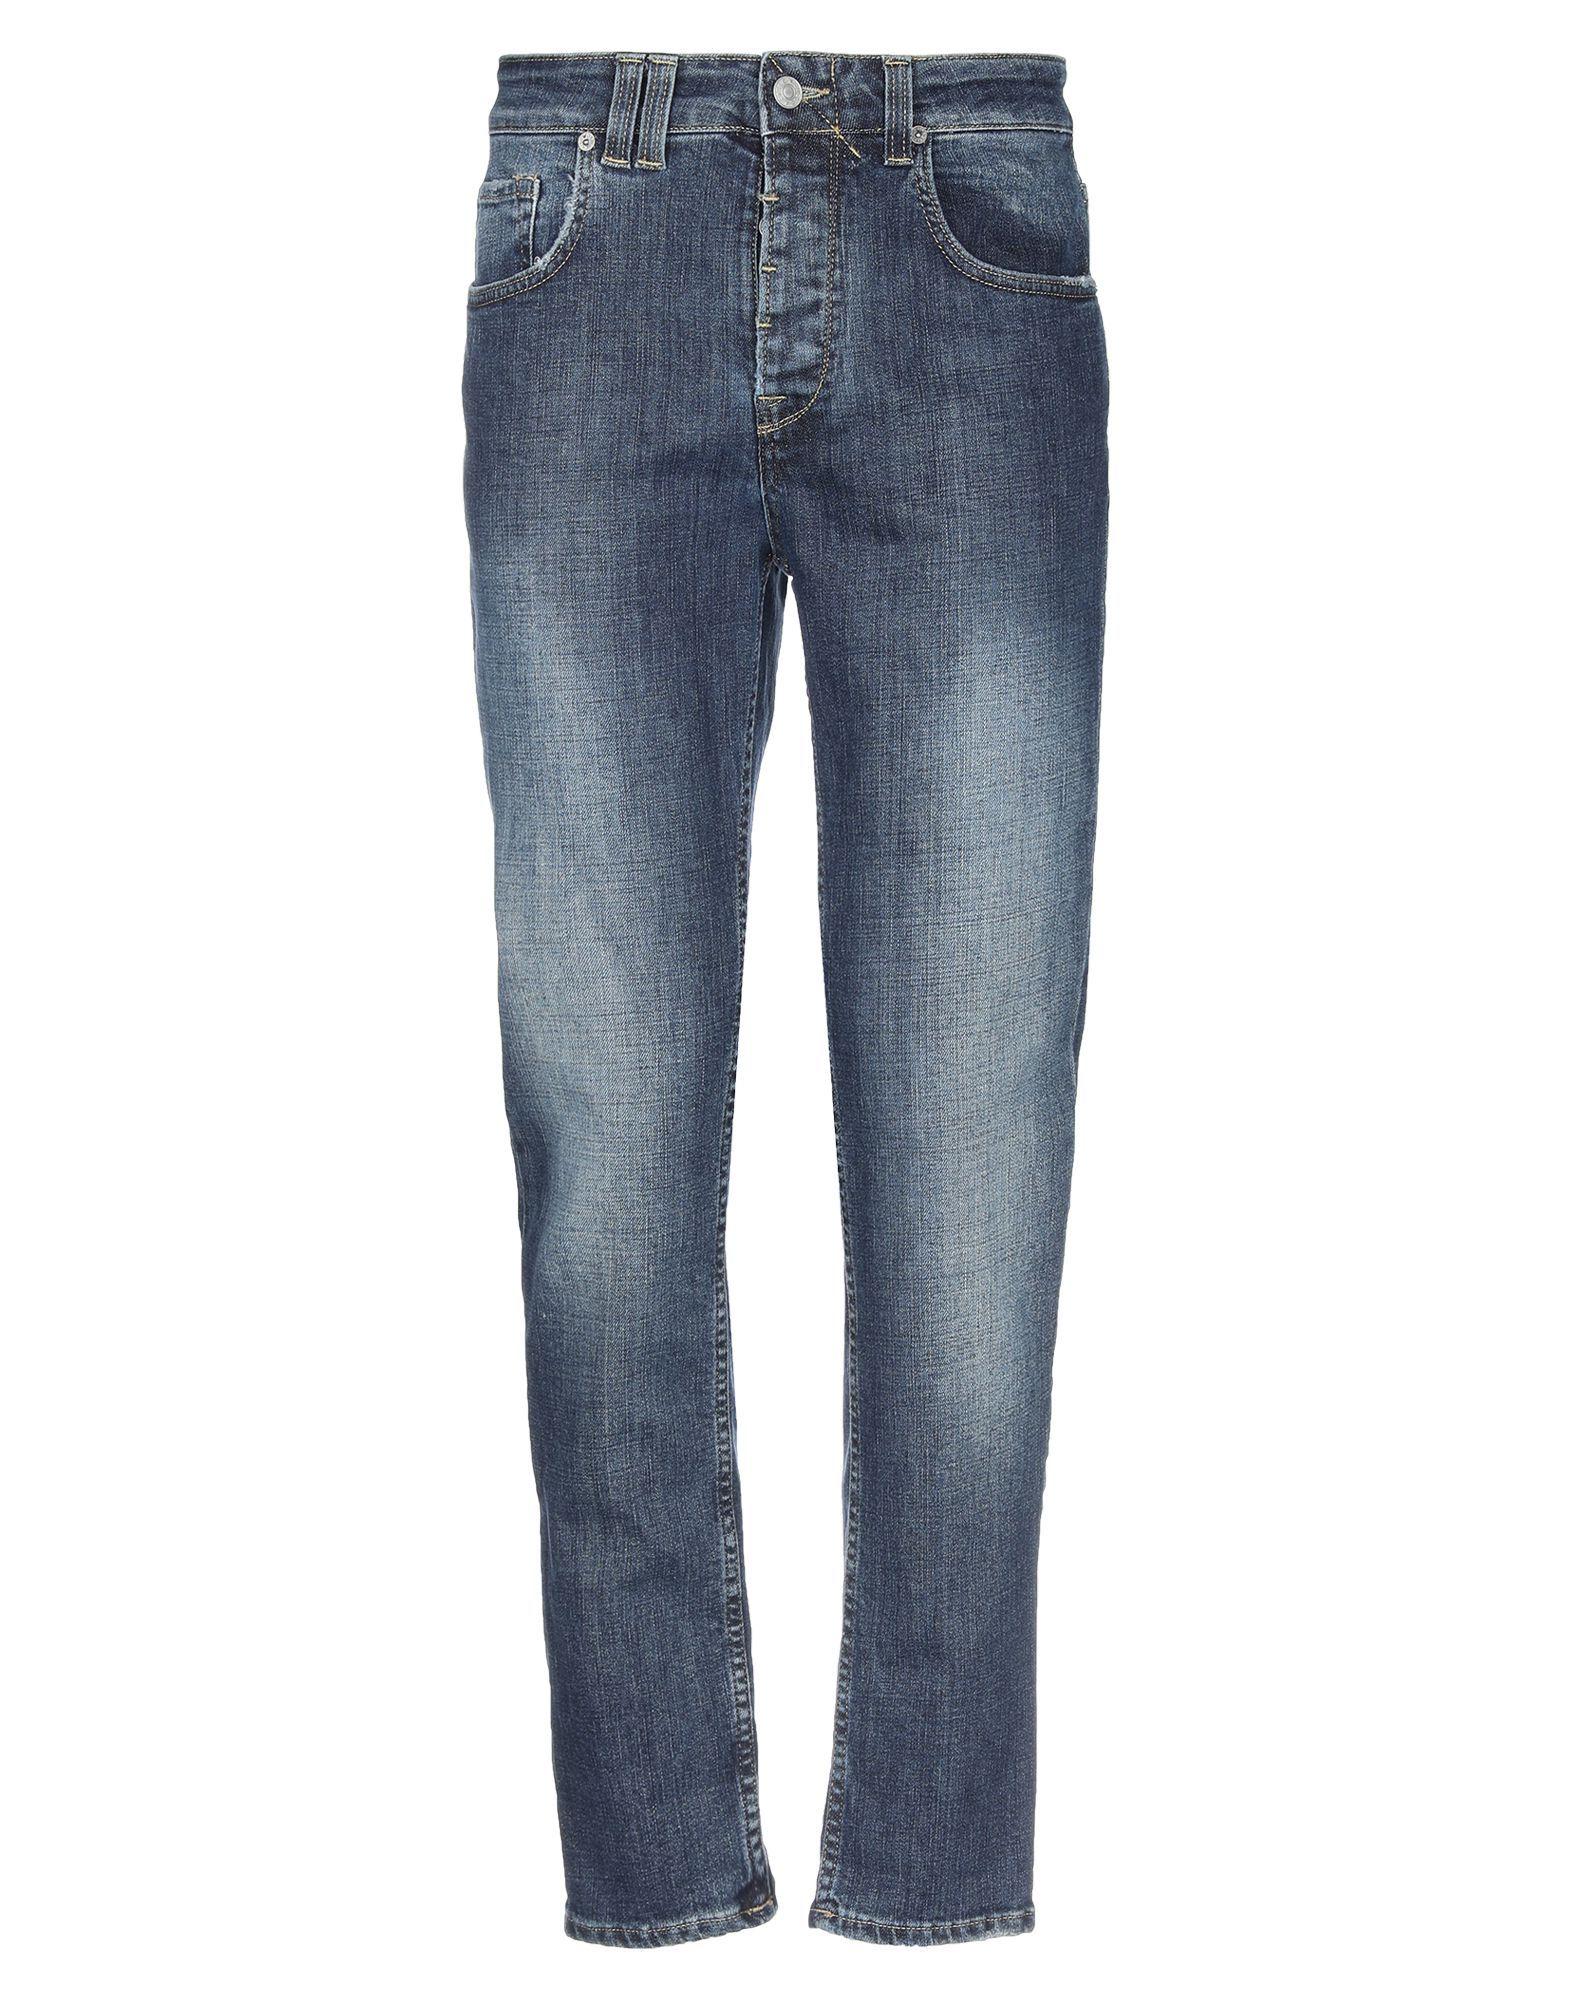 Cycle Man Denim trousers Blue Cotton